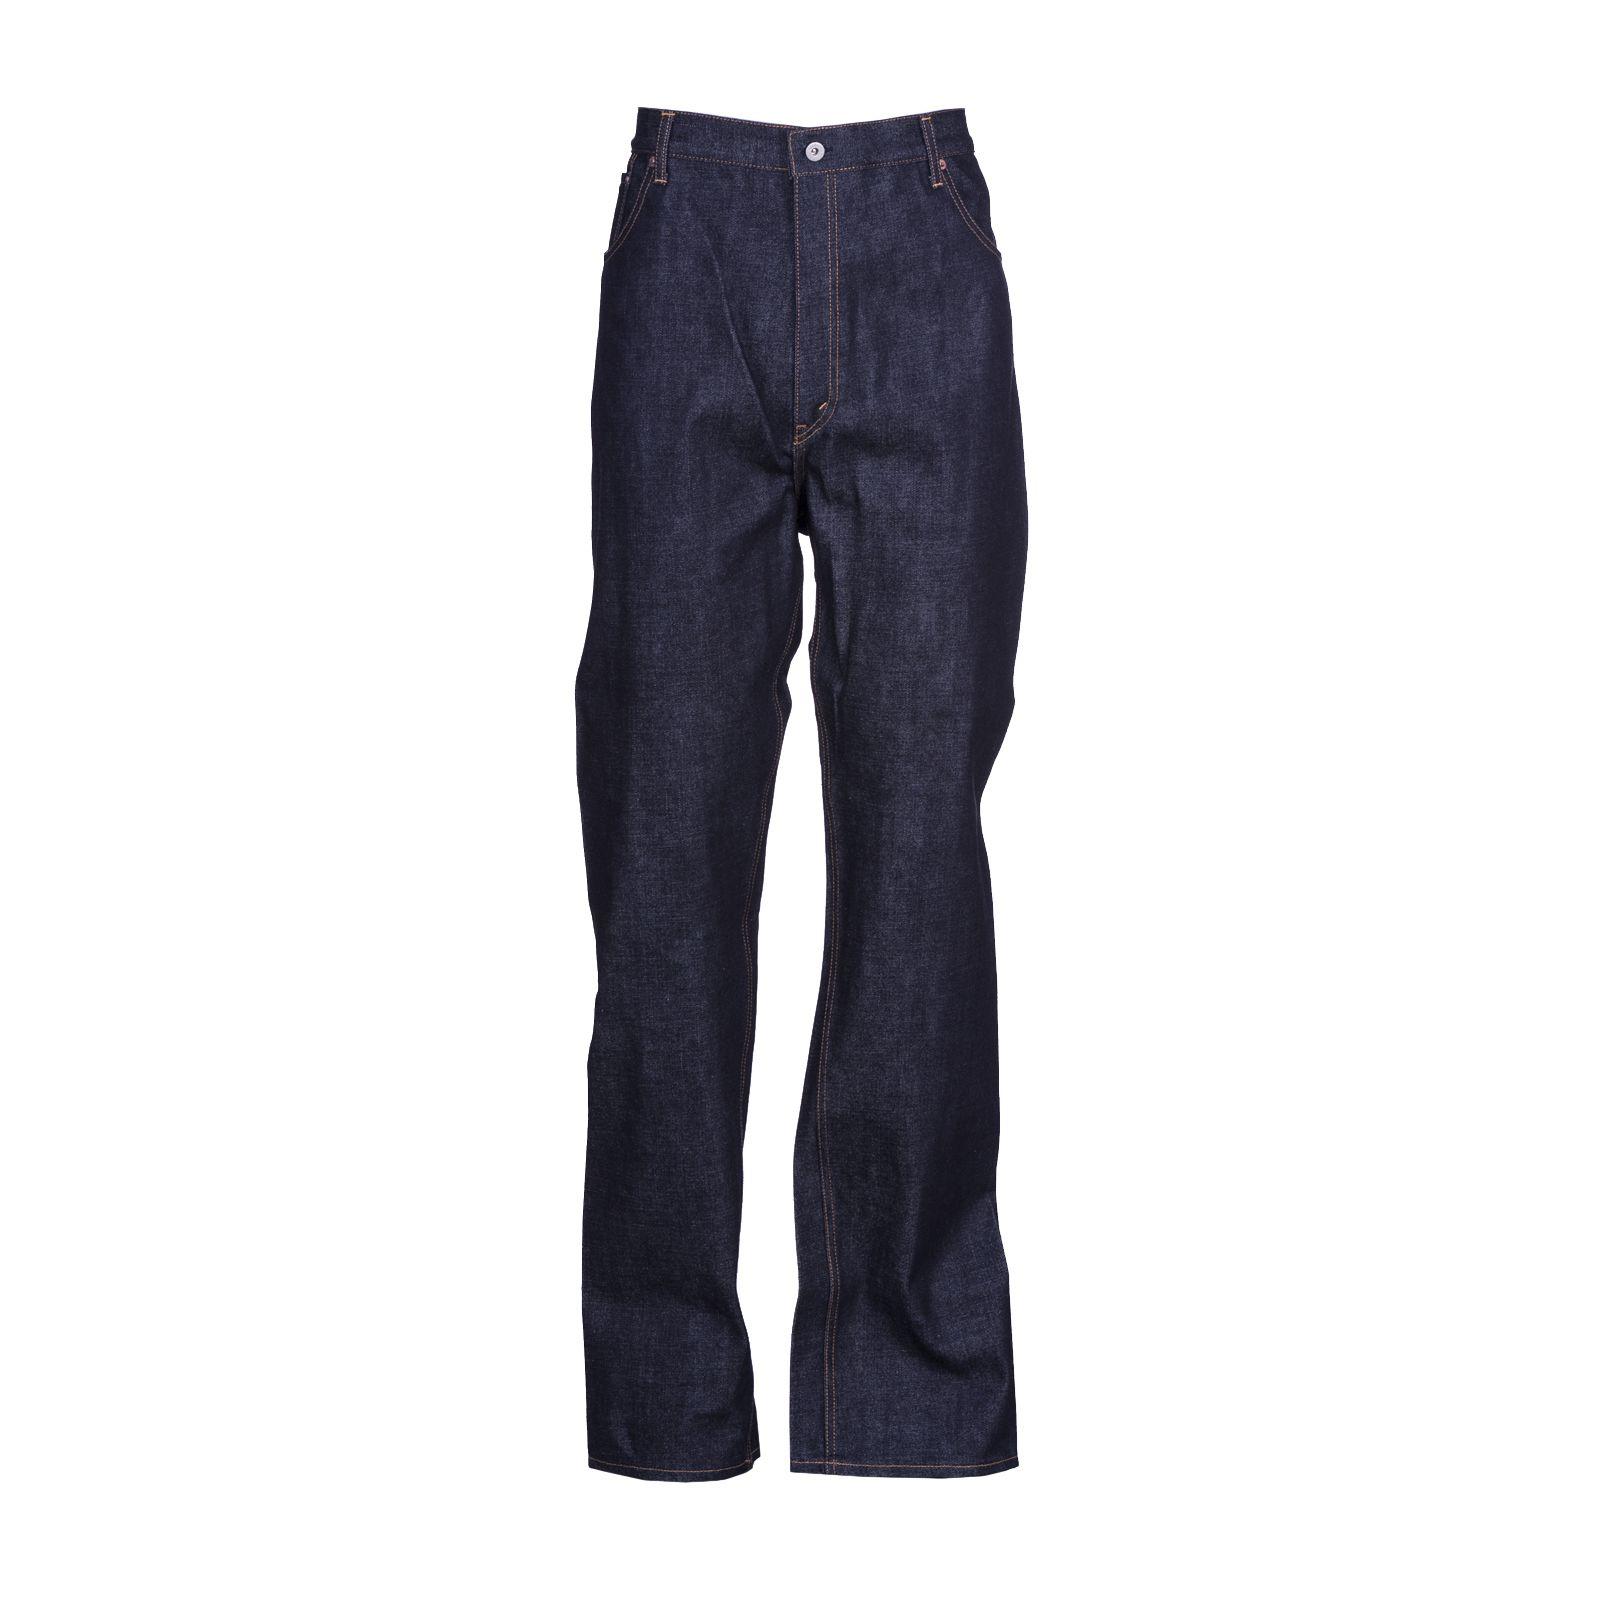 Wide-leg Jeans From Junya Watanabe